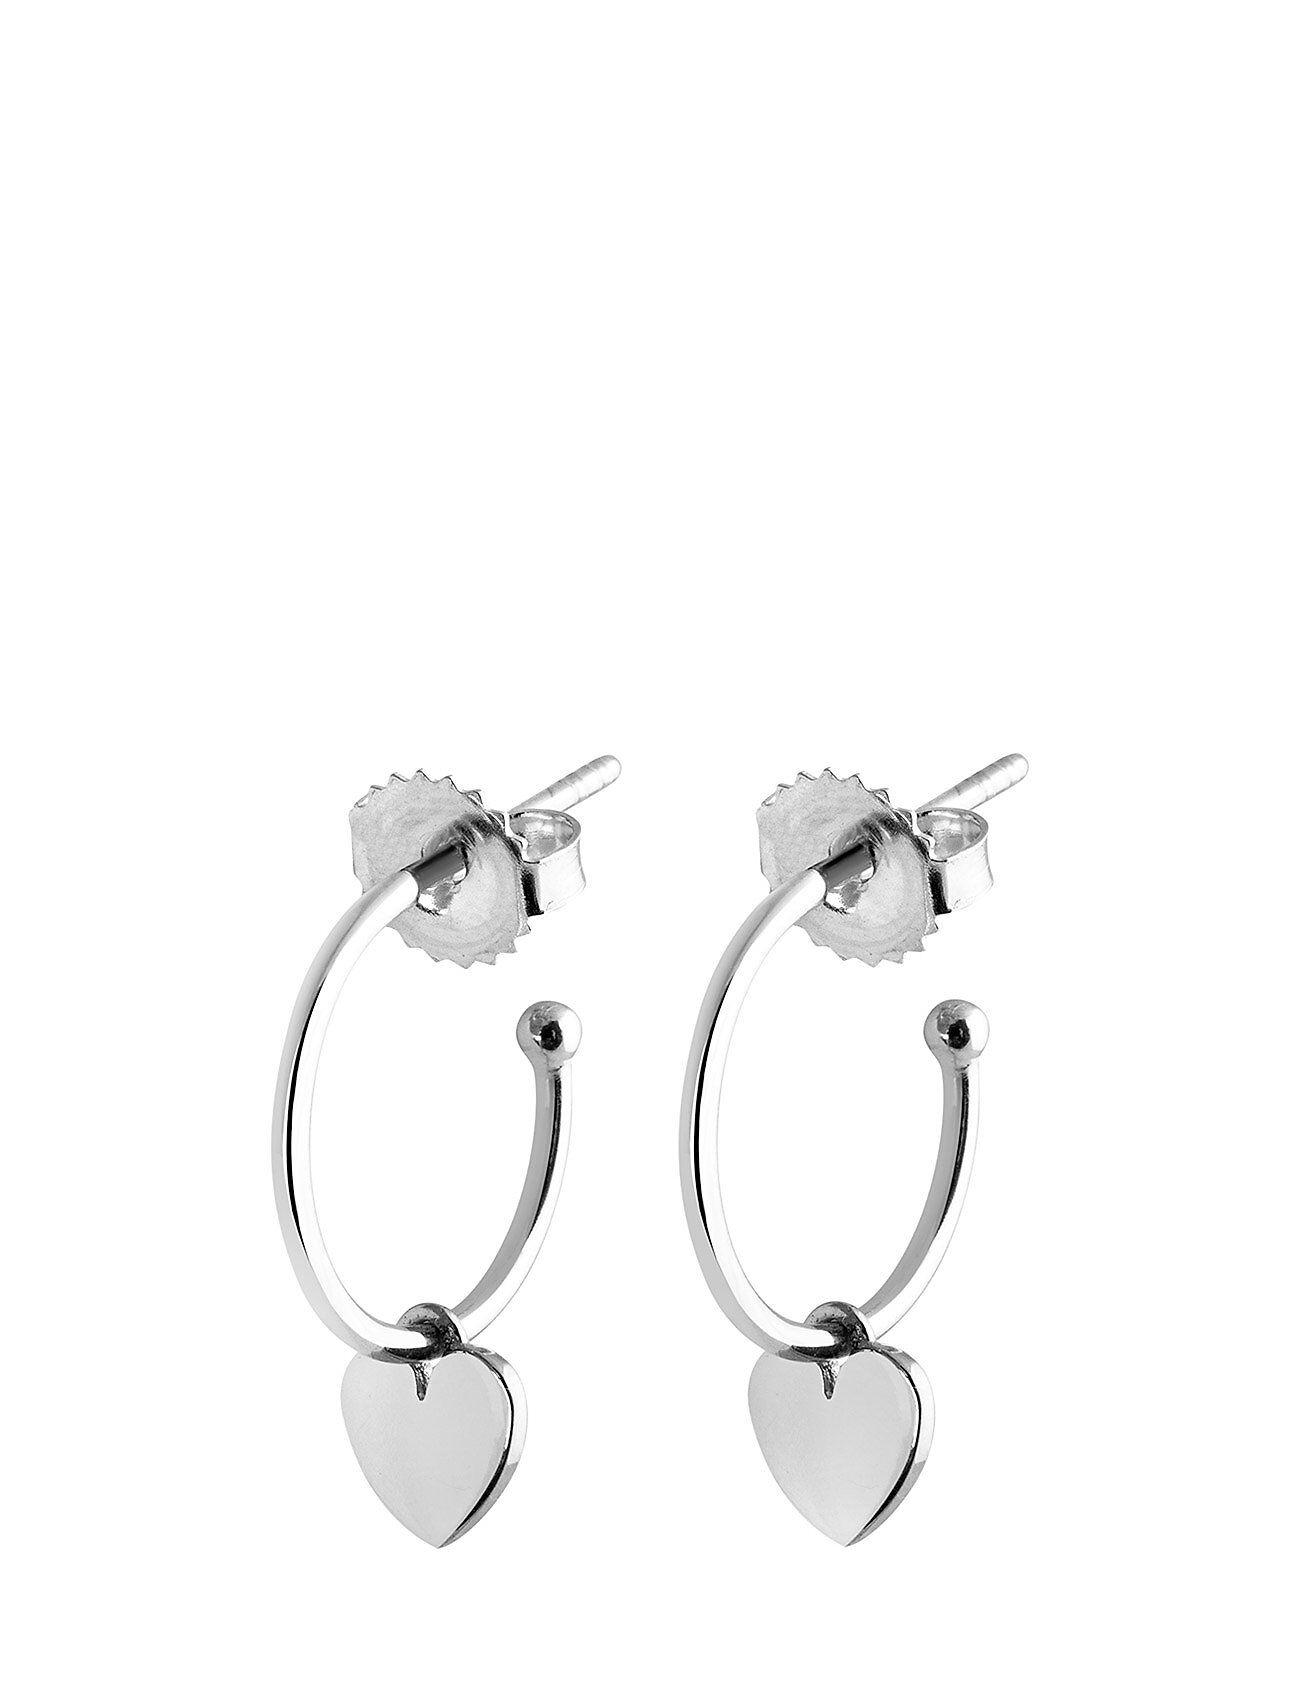 SOPHIE by SOPHIE Mini Hoops Heart Accessories Jewellery Earrings Hoops Hopea SOPHIE By SOPHIE